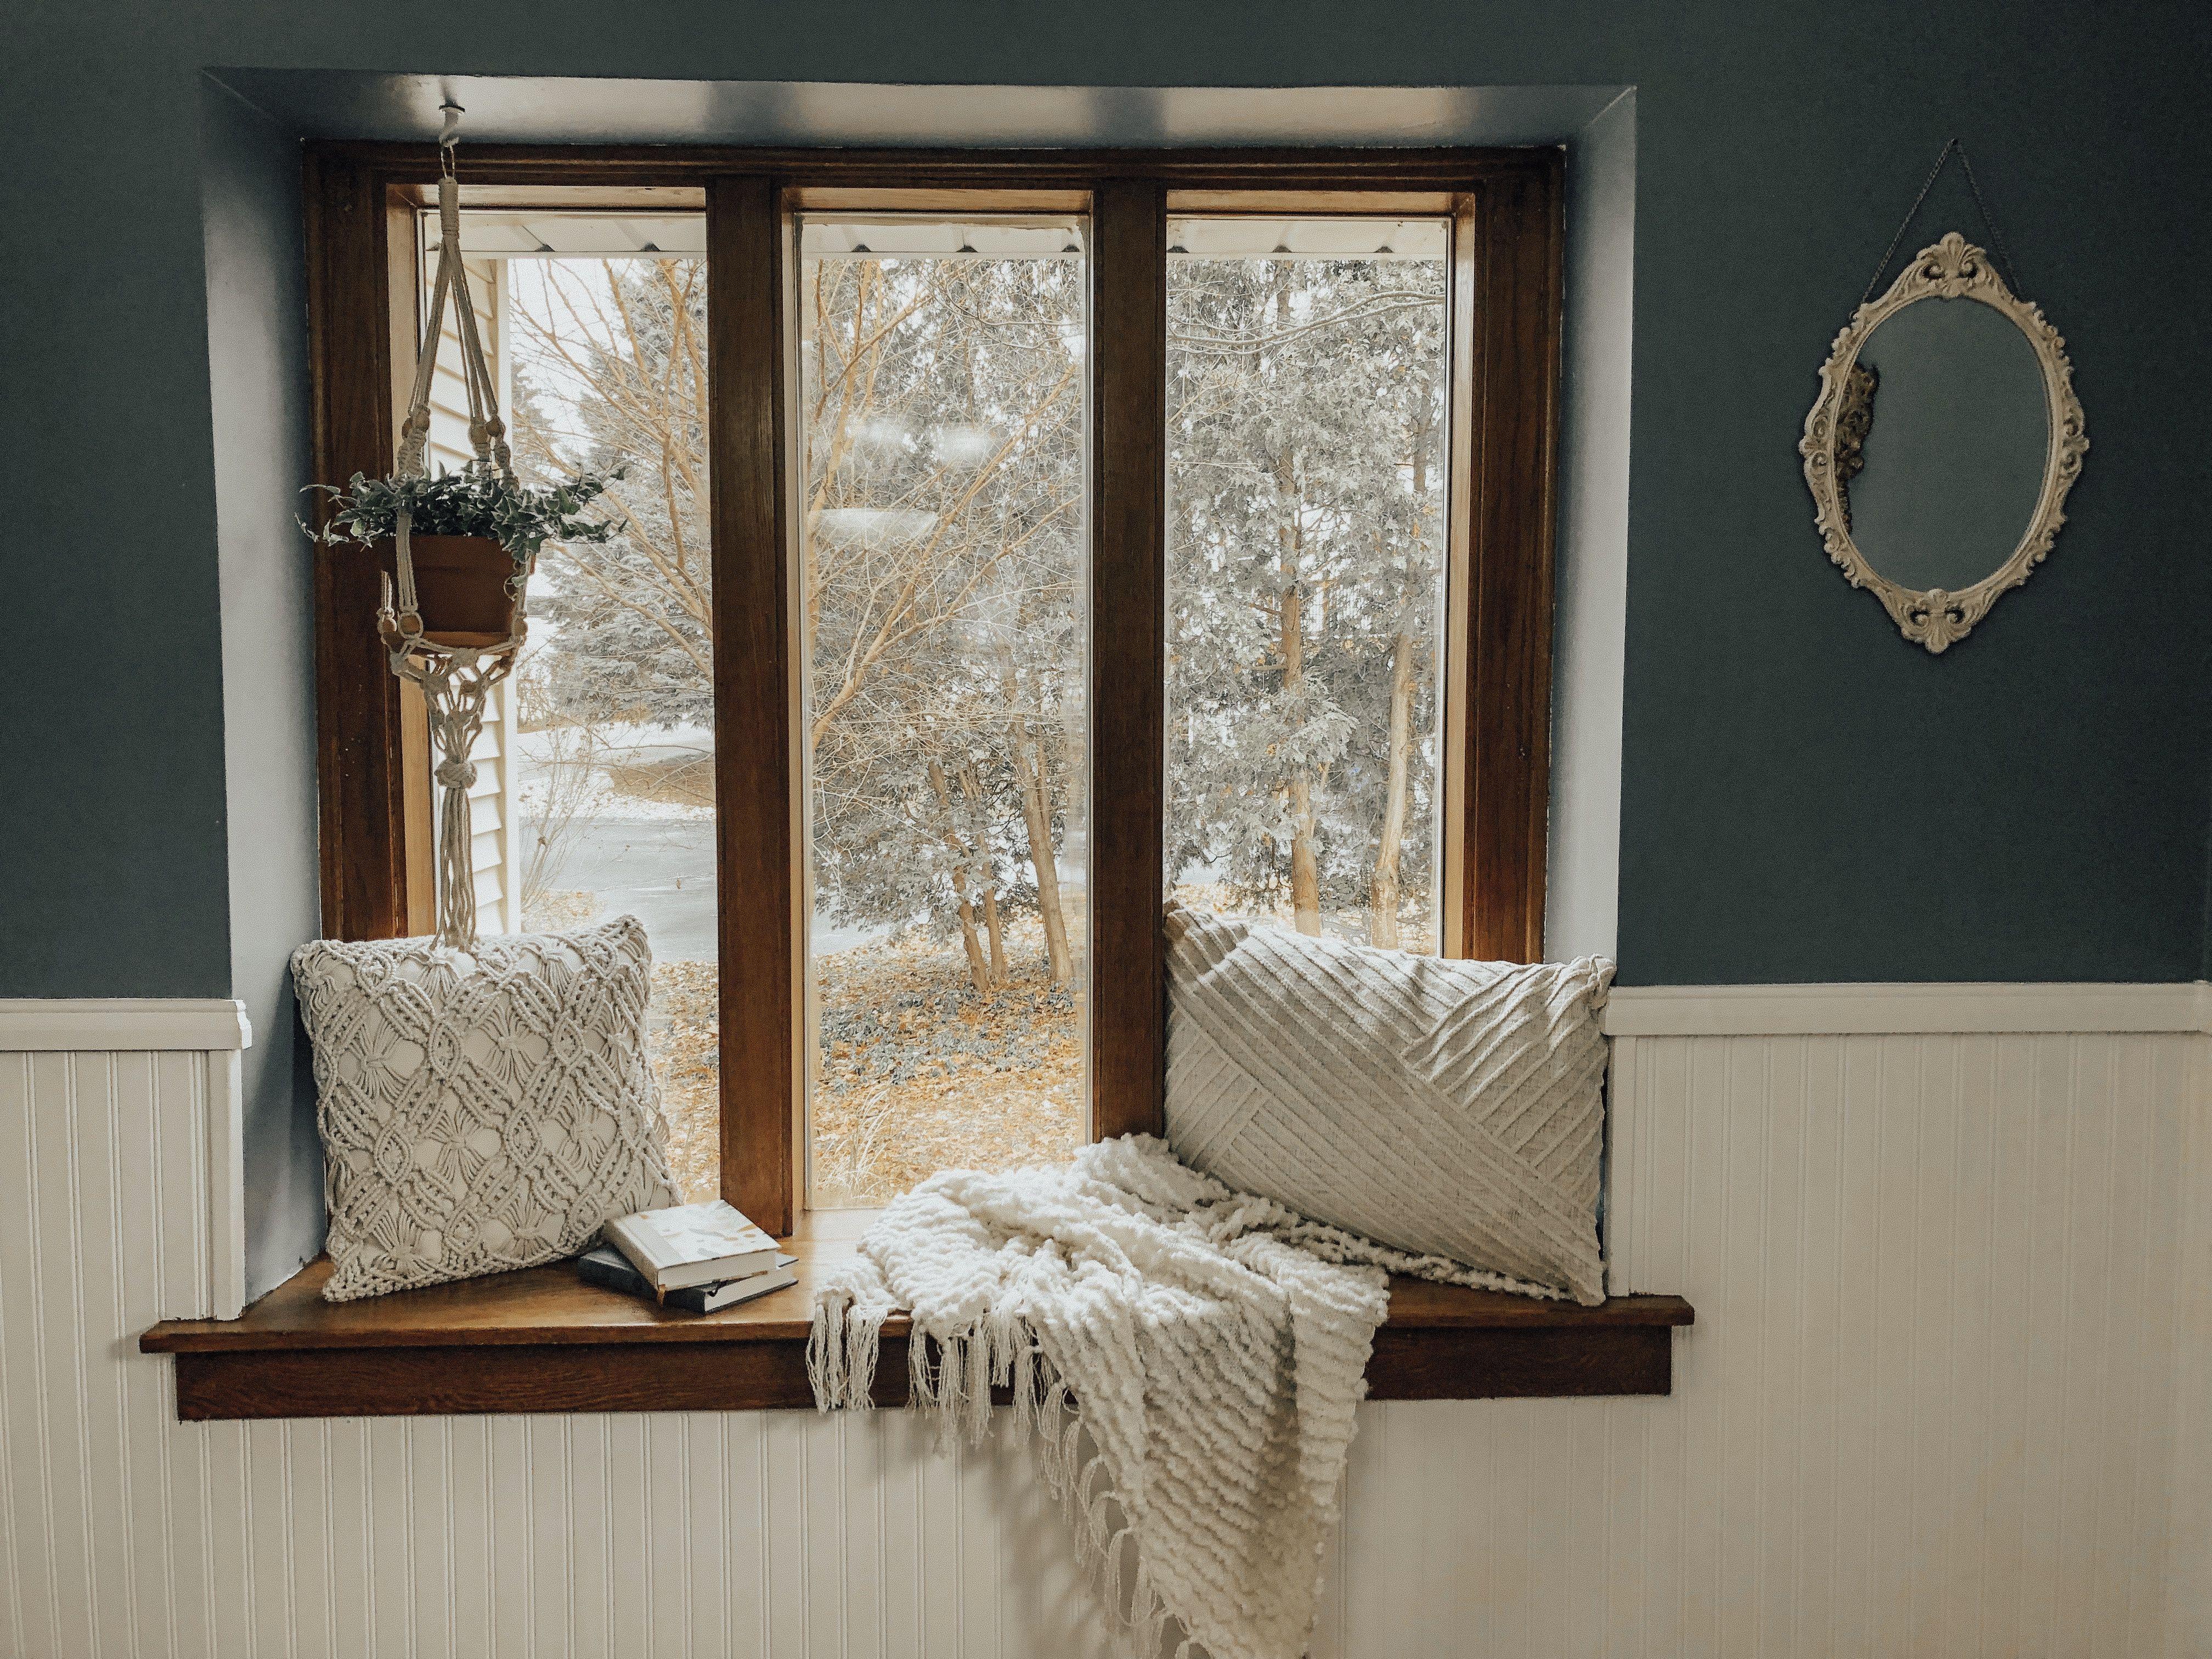 Windowsill Decor Window Sill Decor Decor Pallet Patio Furniture